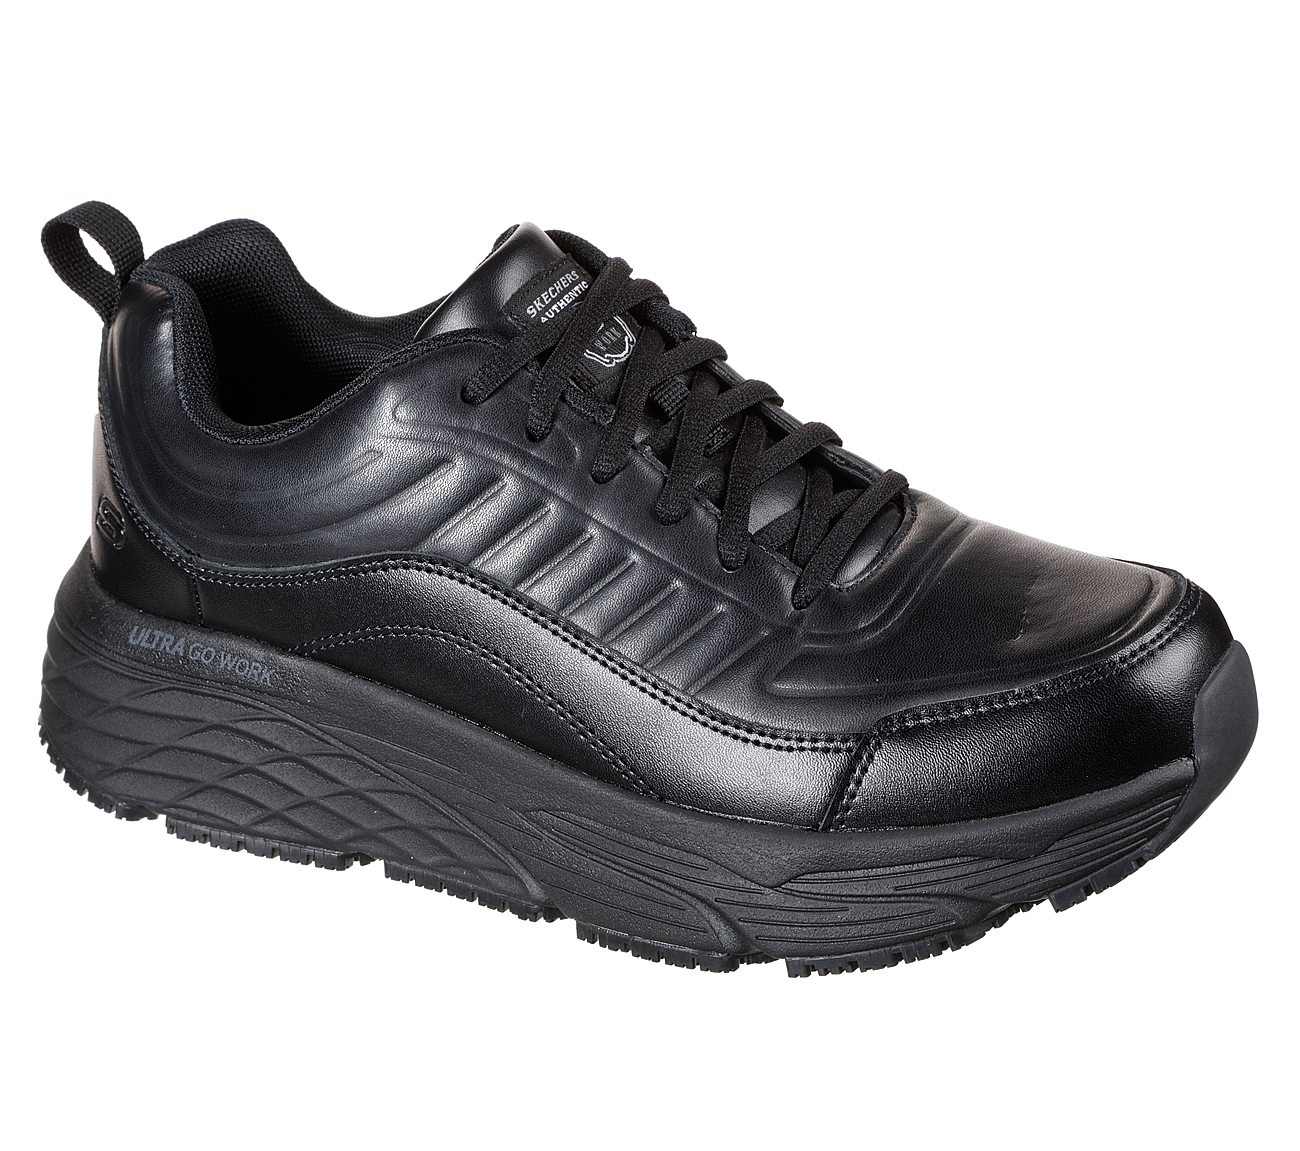 skechers shoes 2000